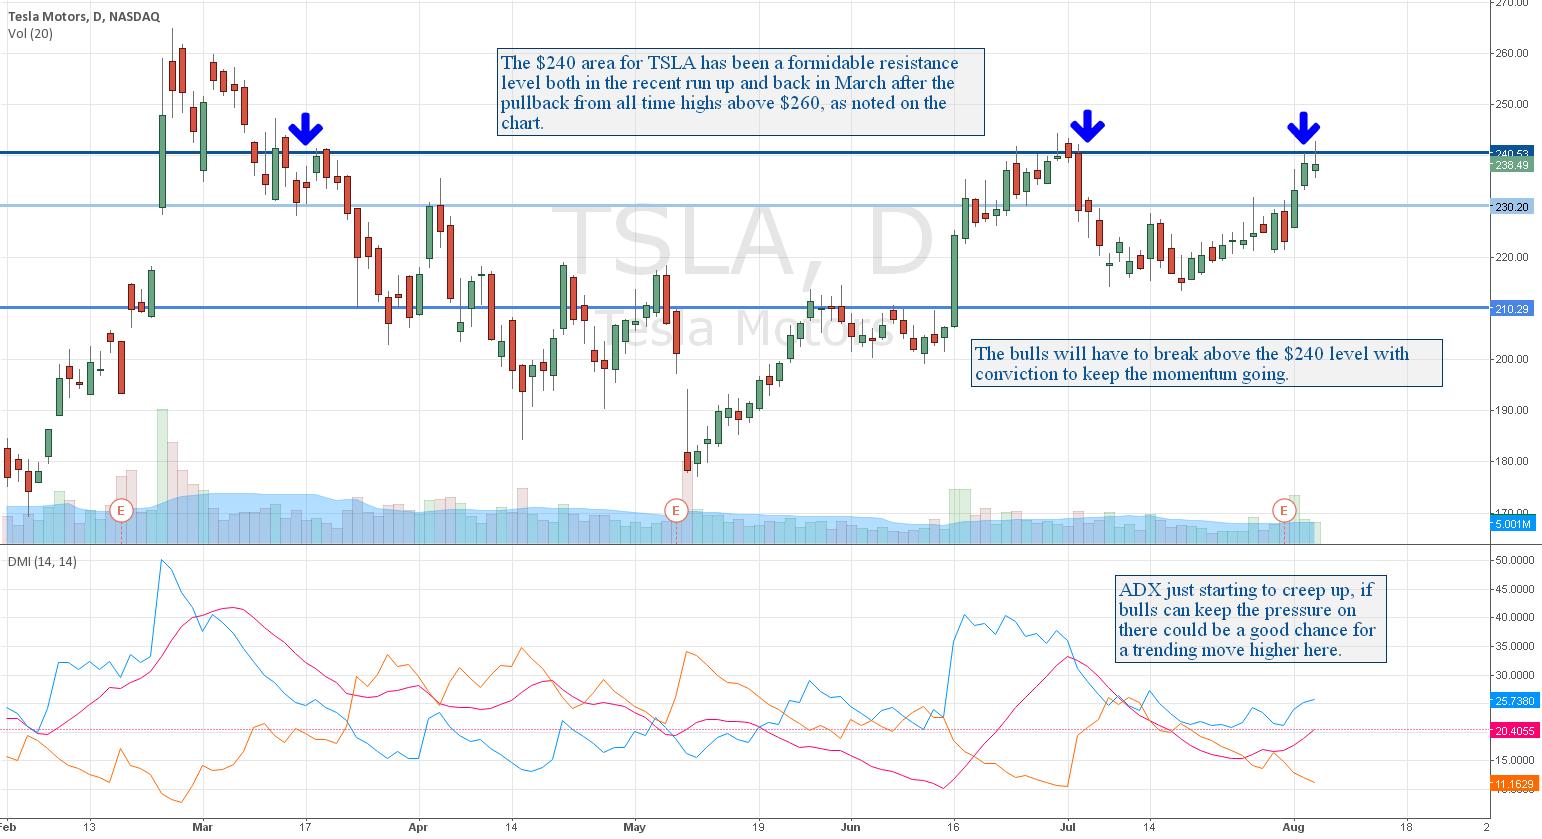 TSLA Struggles at $240